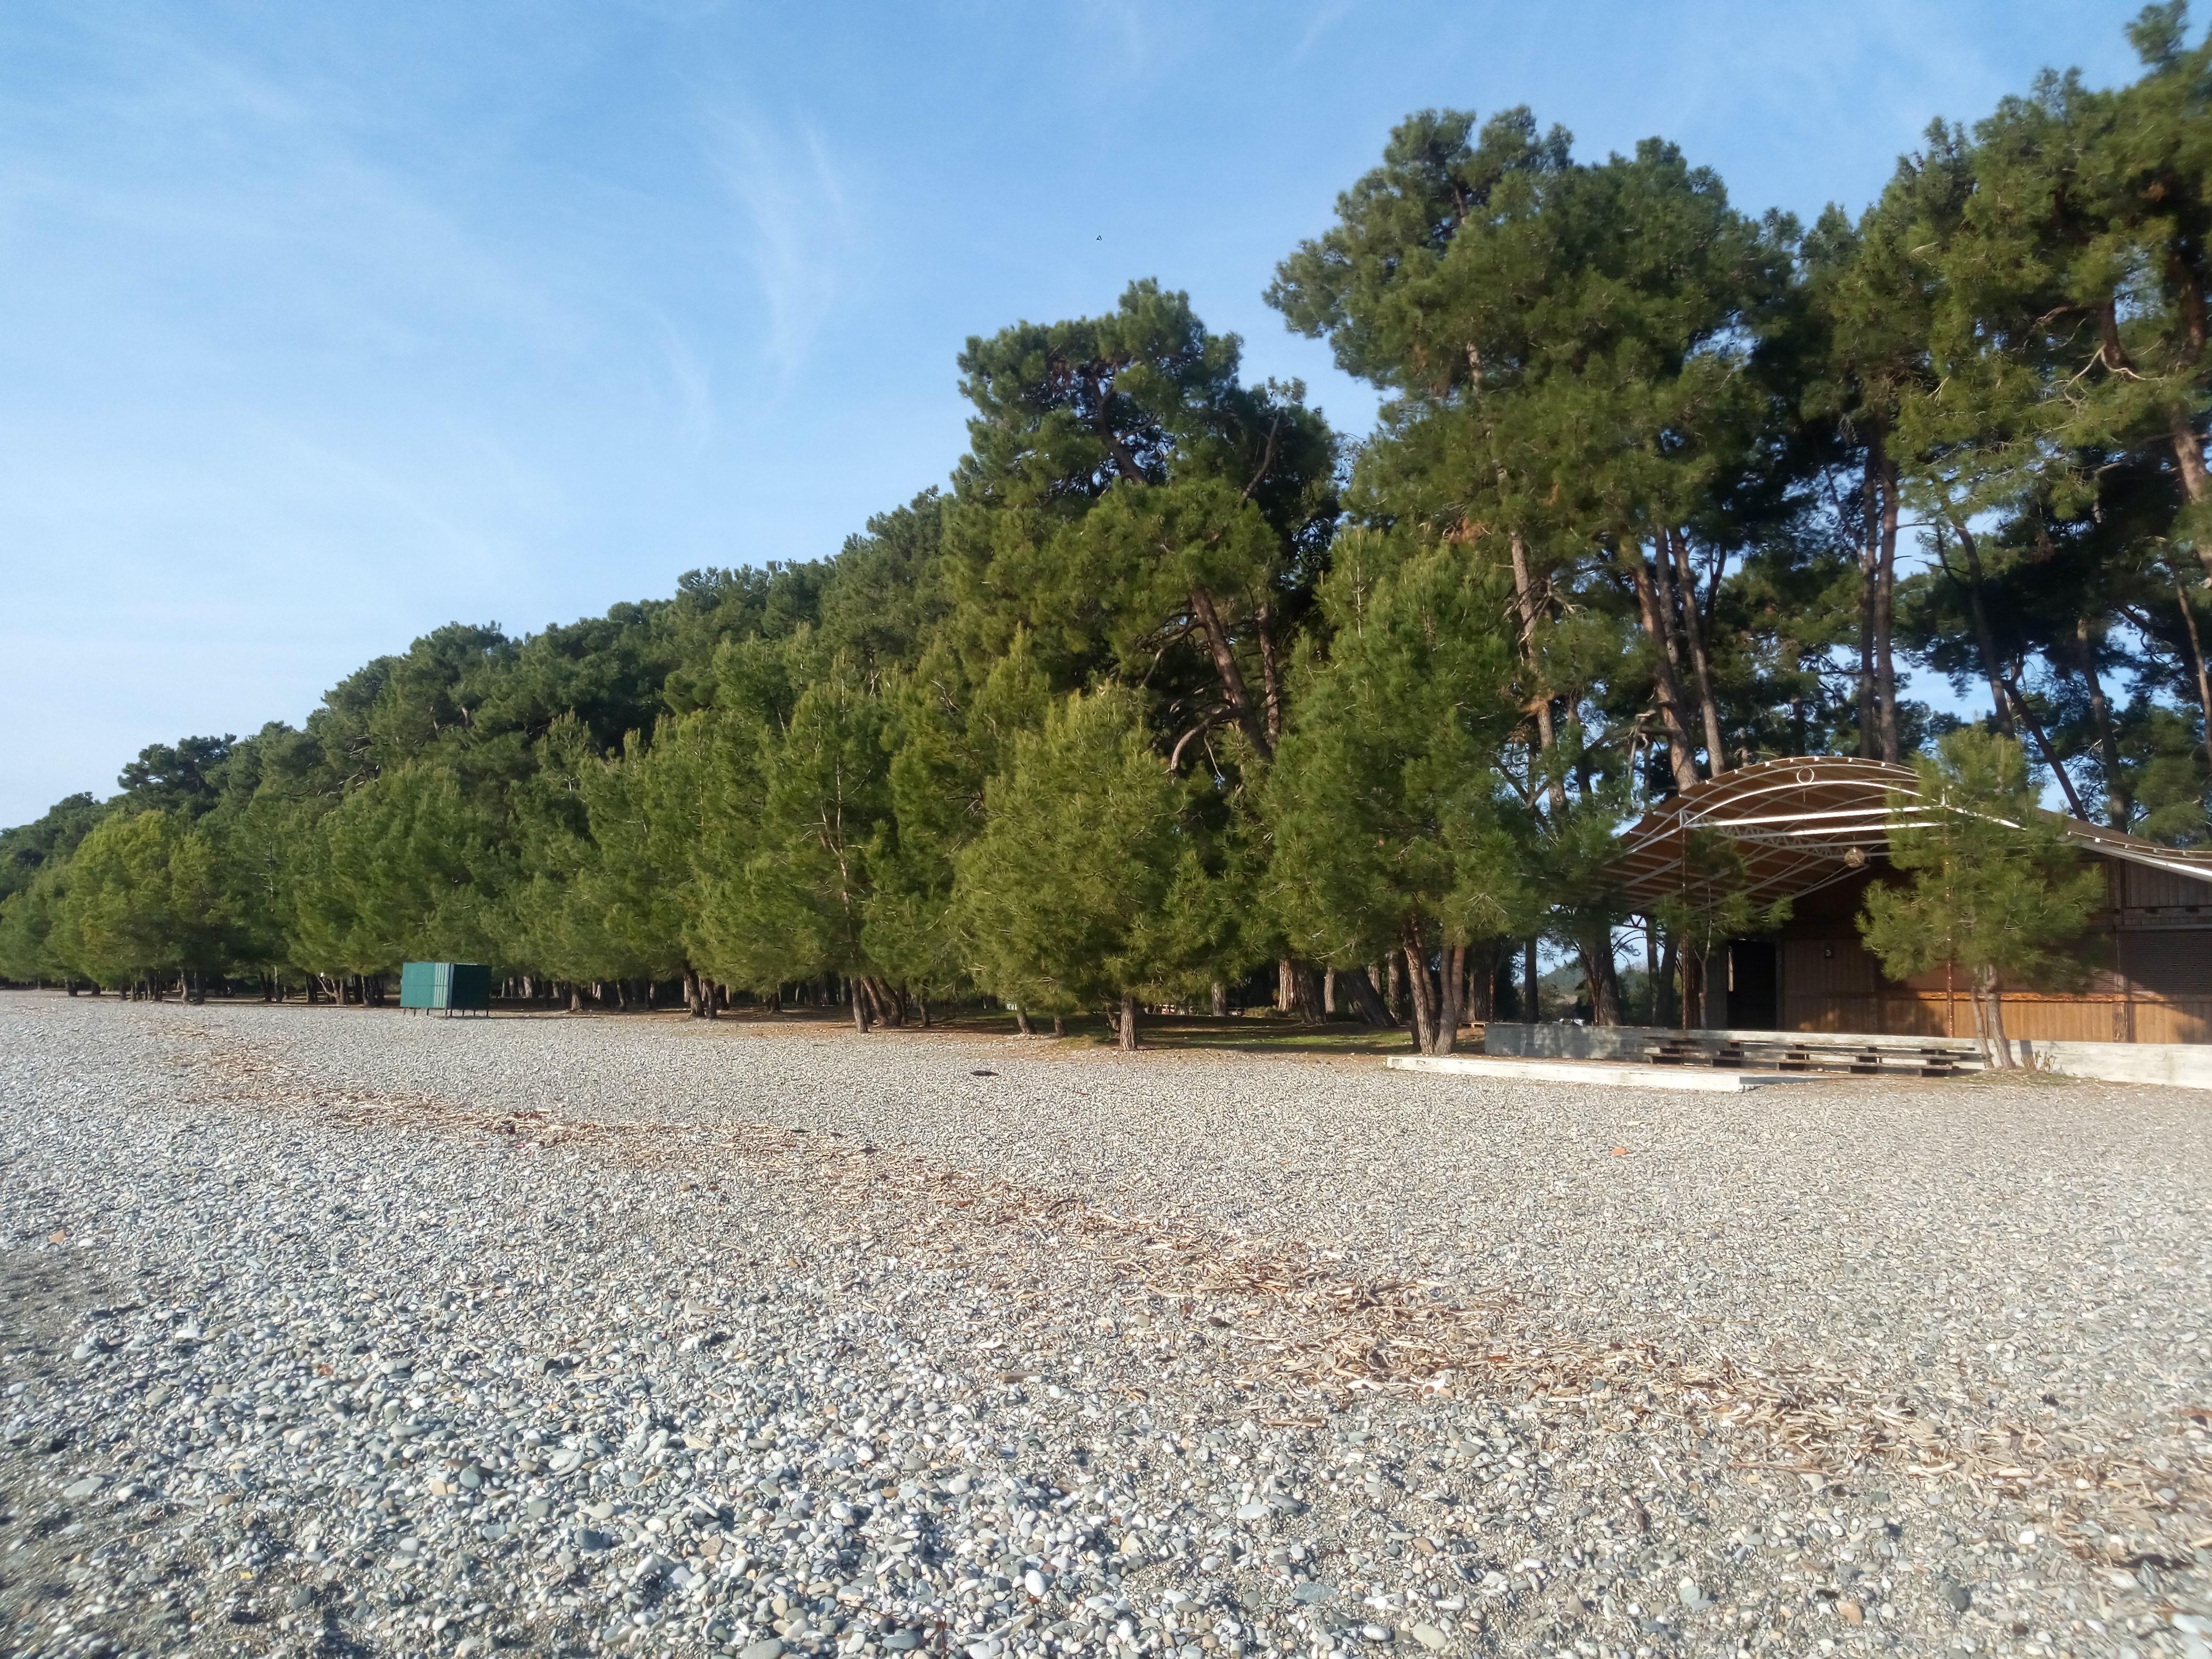 лдзаа пляж в абхазии фото школе